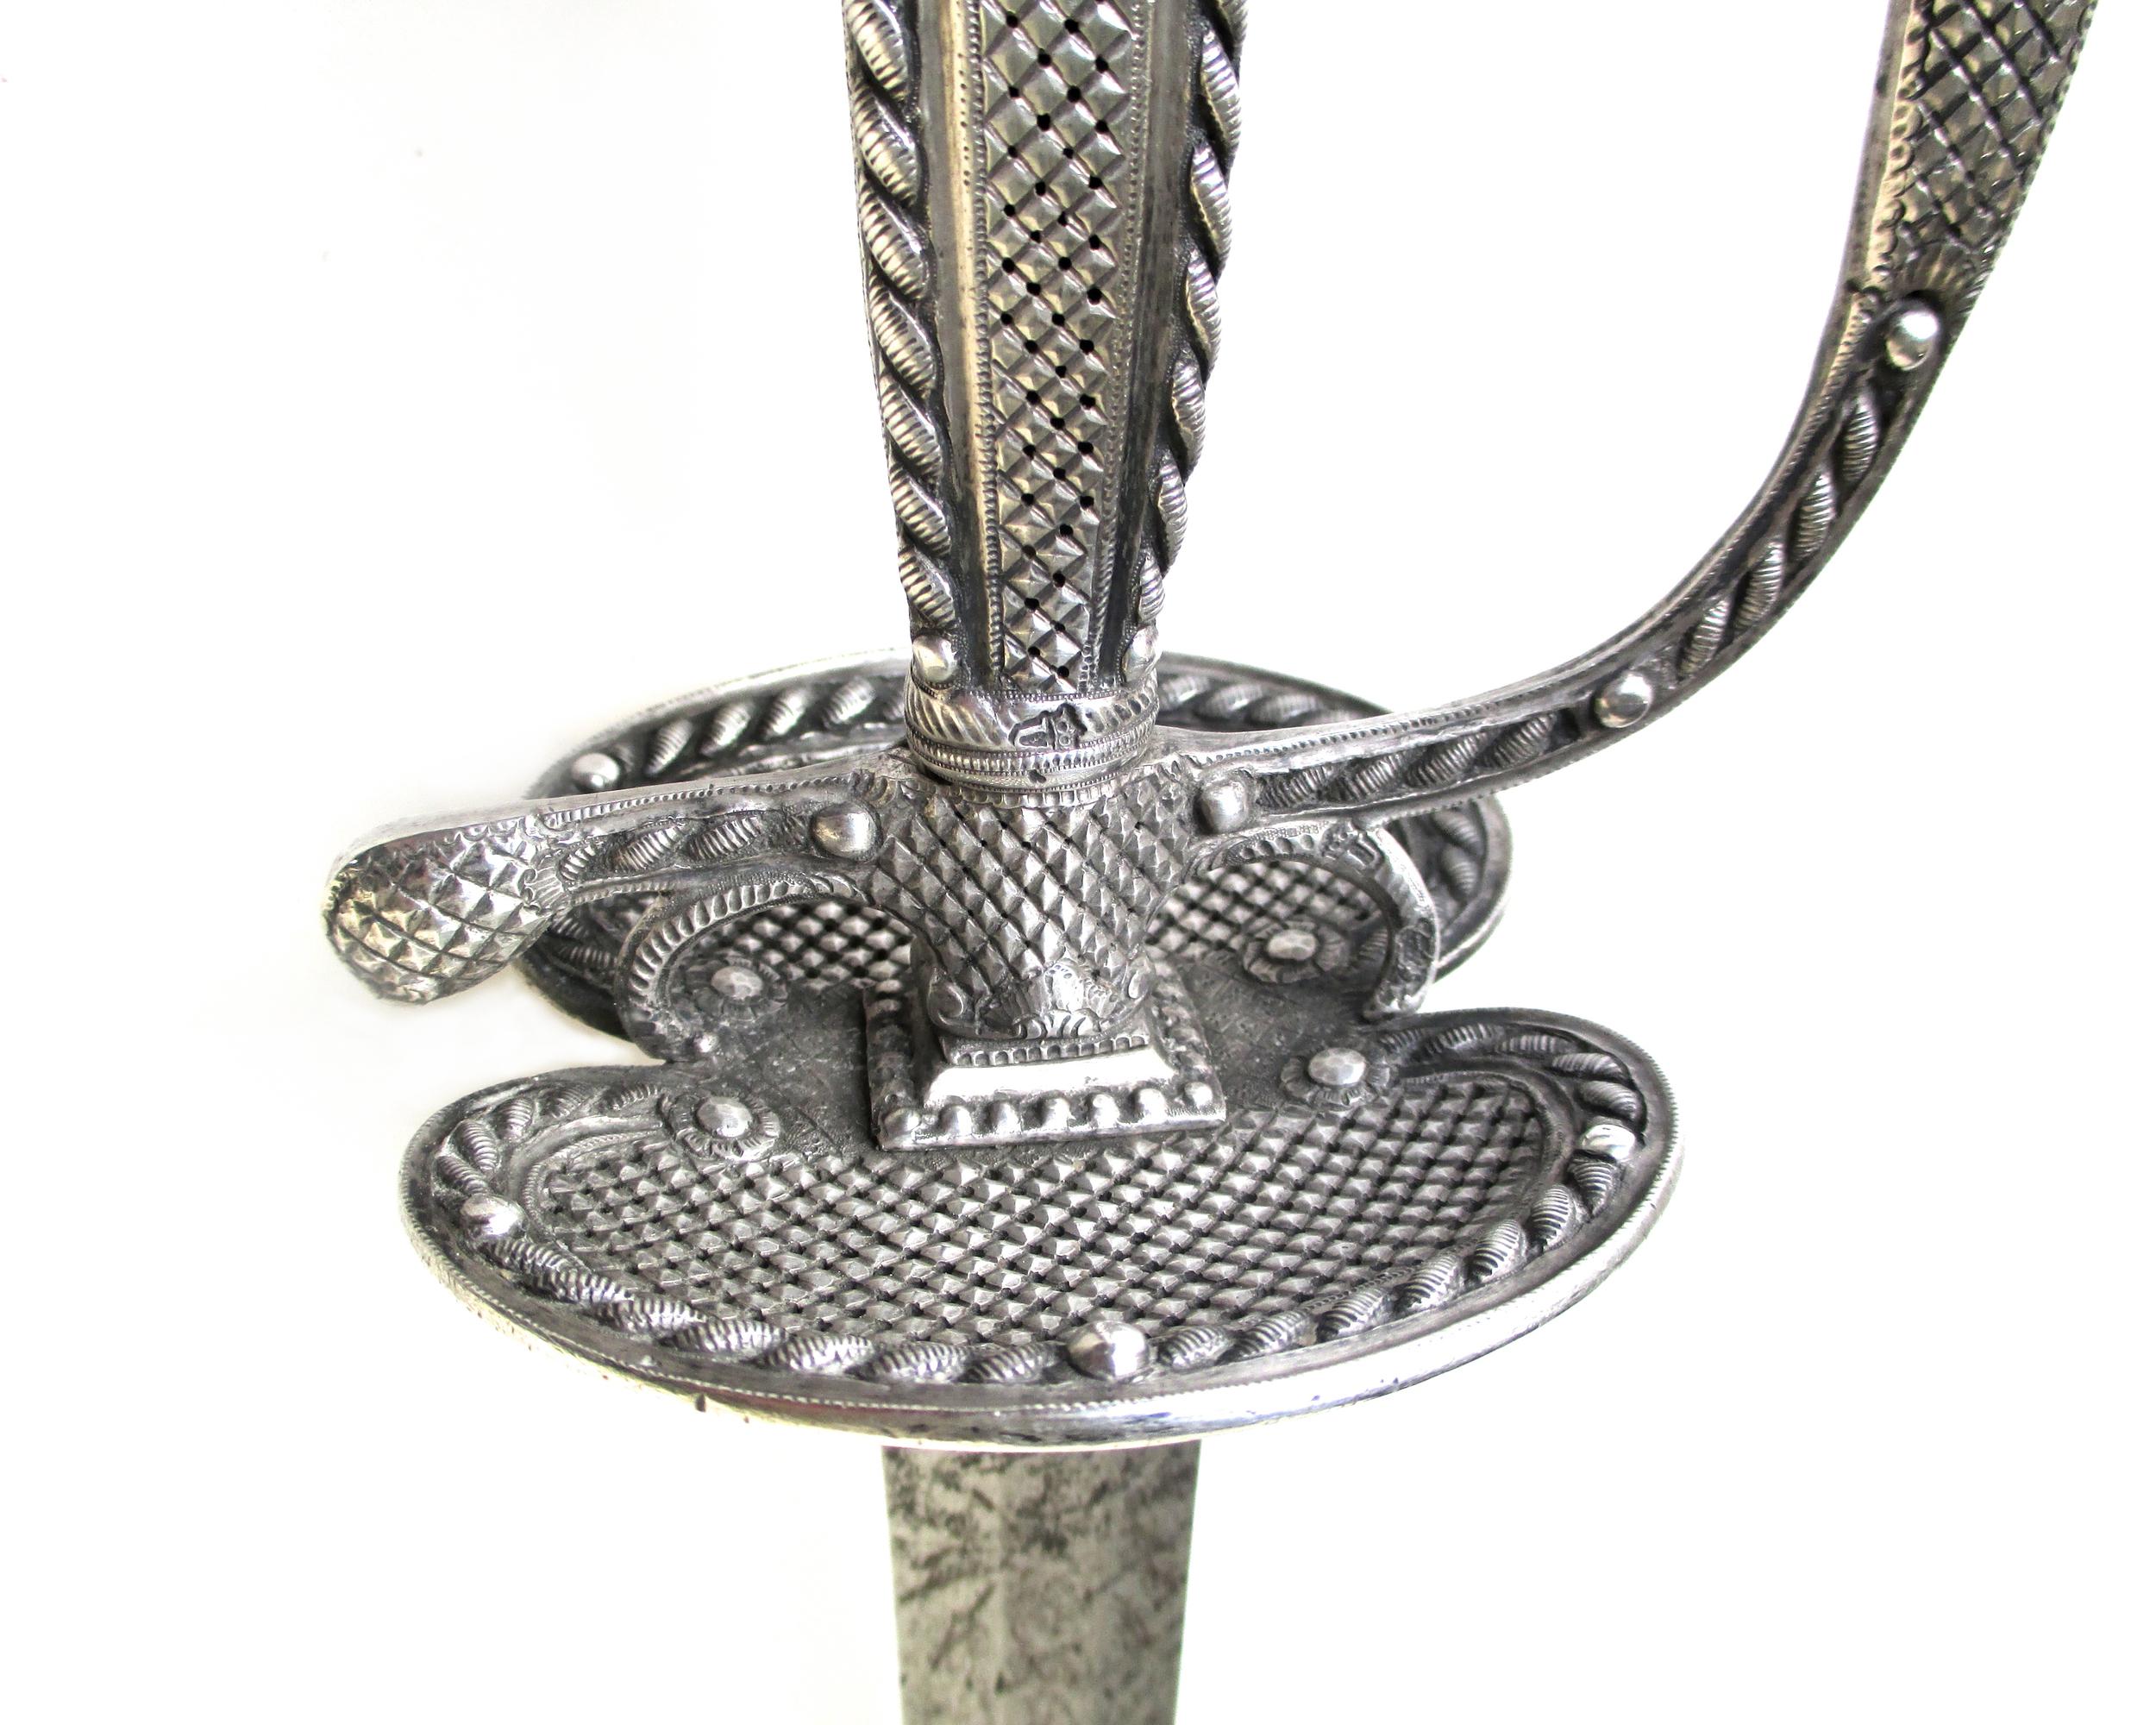 french-silver-hilt-sword-weapon-18thcentury-gary-friedland-arms-armor-4.jpg